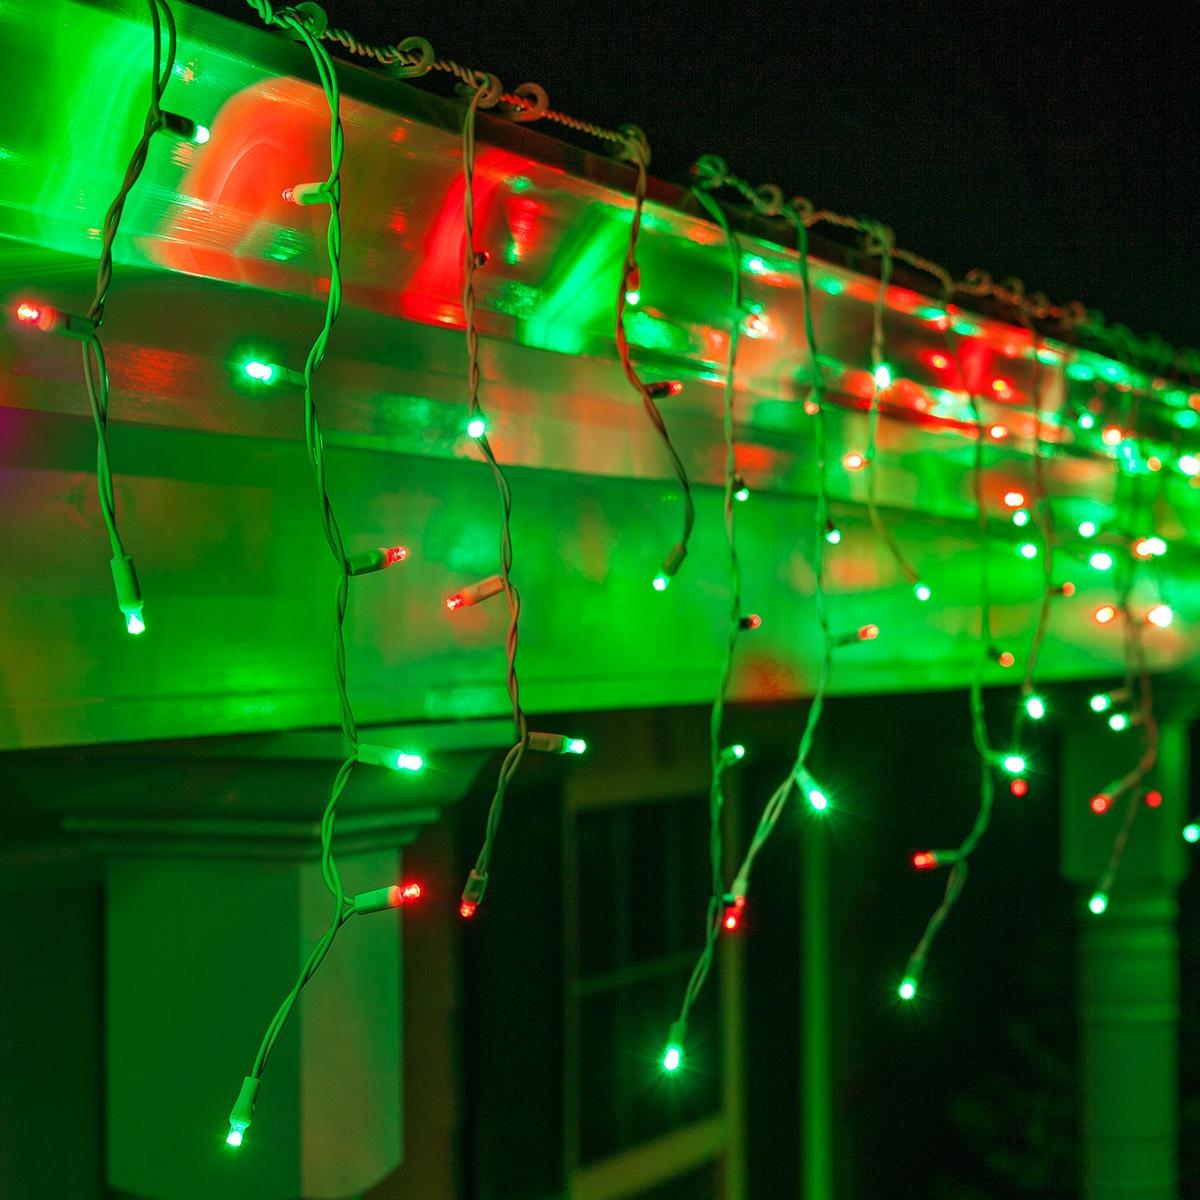 Led Christmas Lights 70 5mm Red Green Led Icicle Lights